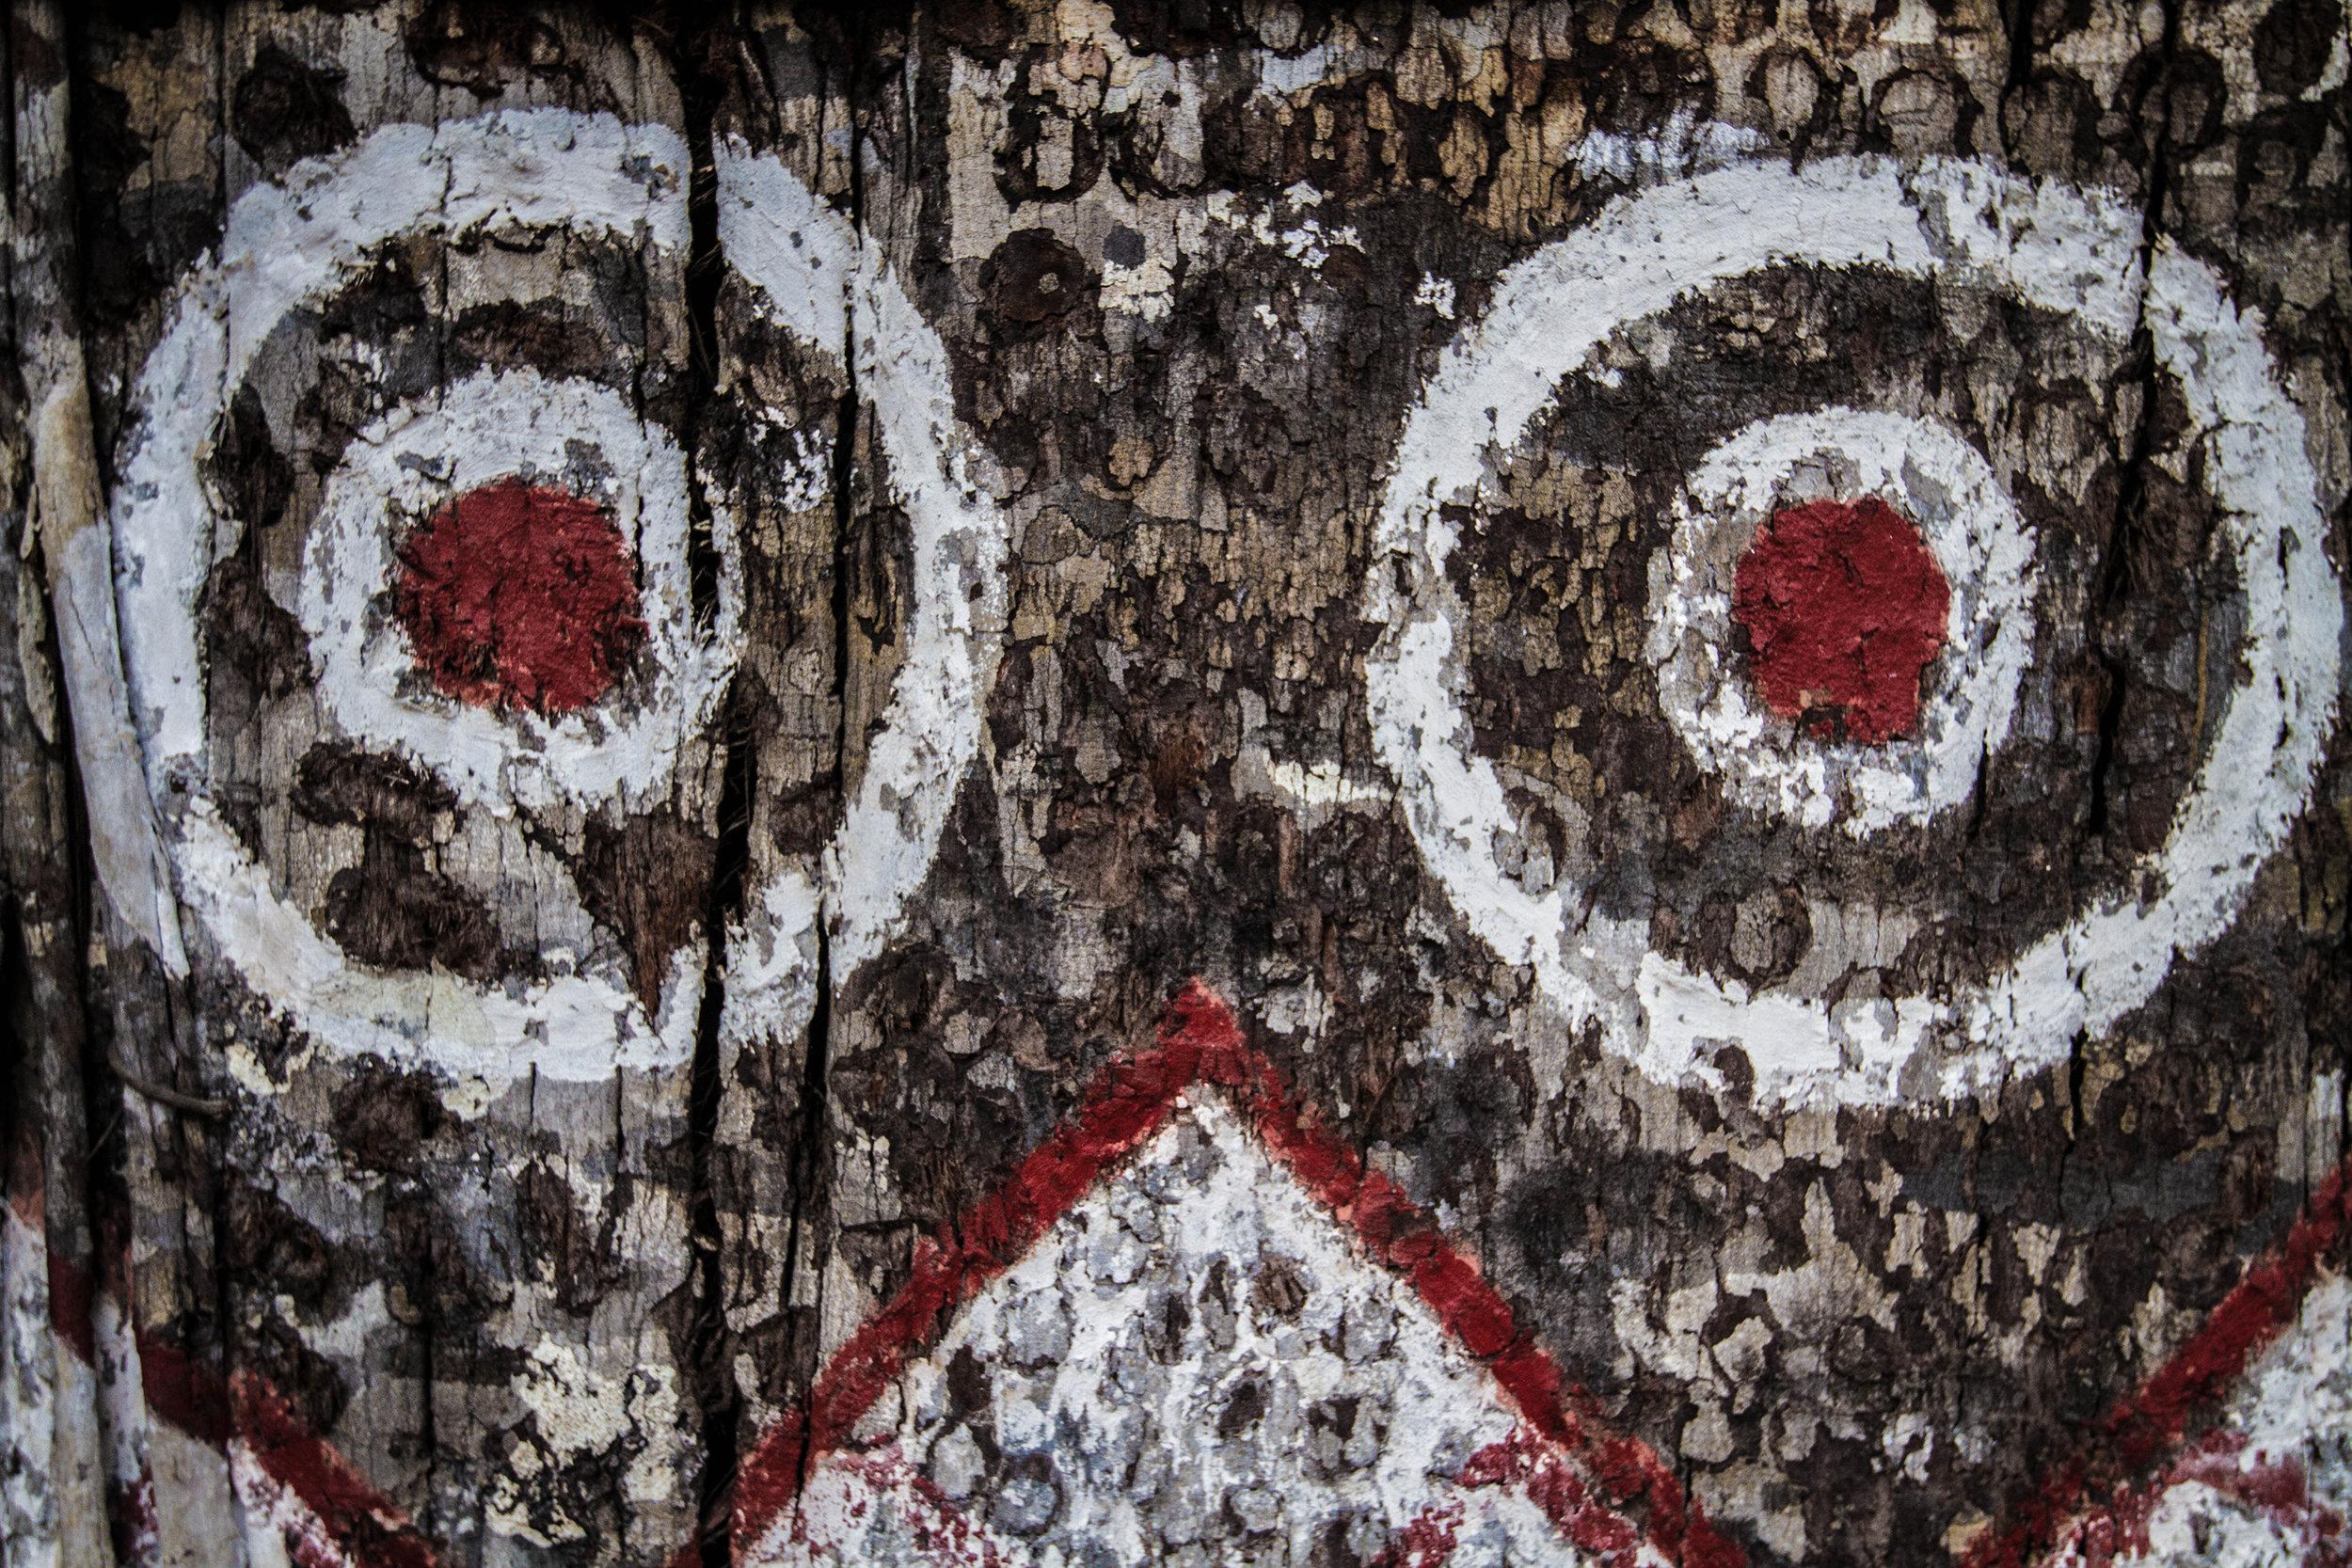 b_pedro bayeux tribe art 2.jpg